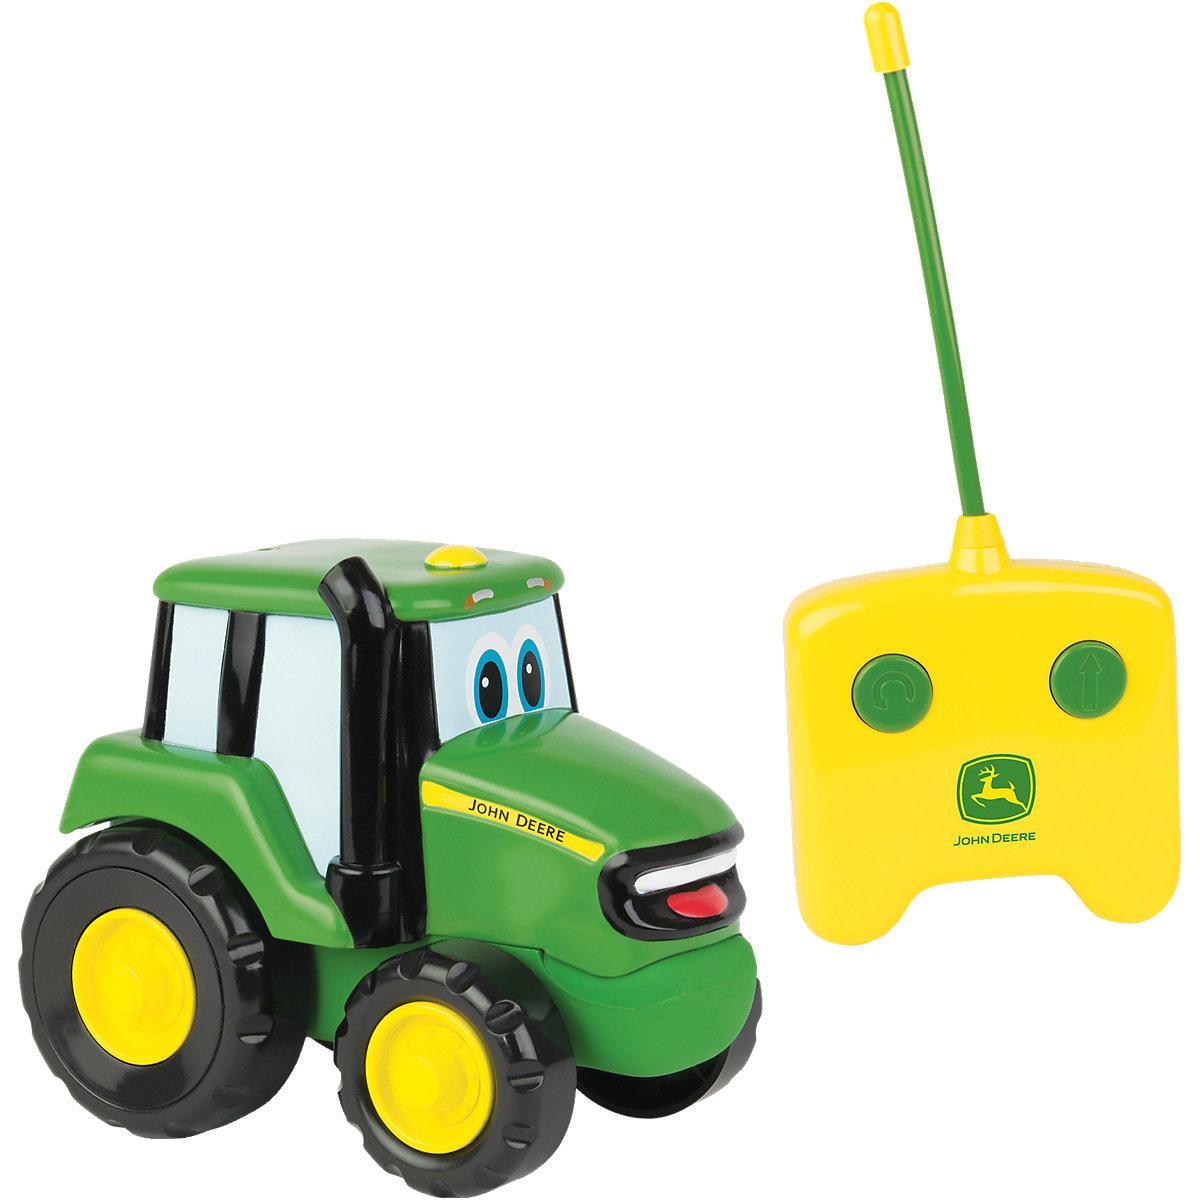 ferngesteuerter johnny traktor john deere mytoys. Black Bedroom Furniture Sets. Home Design Ideas